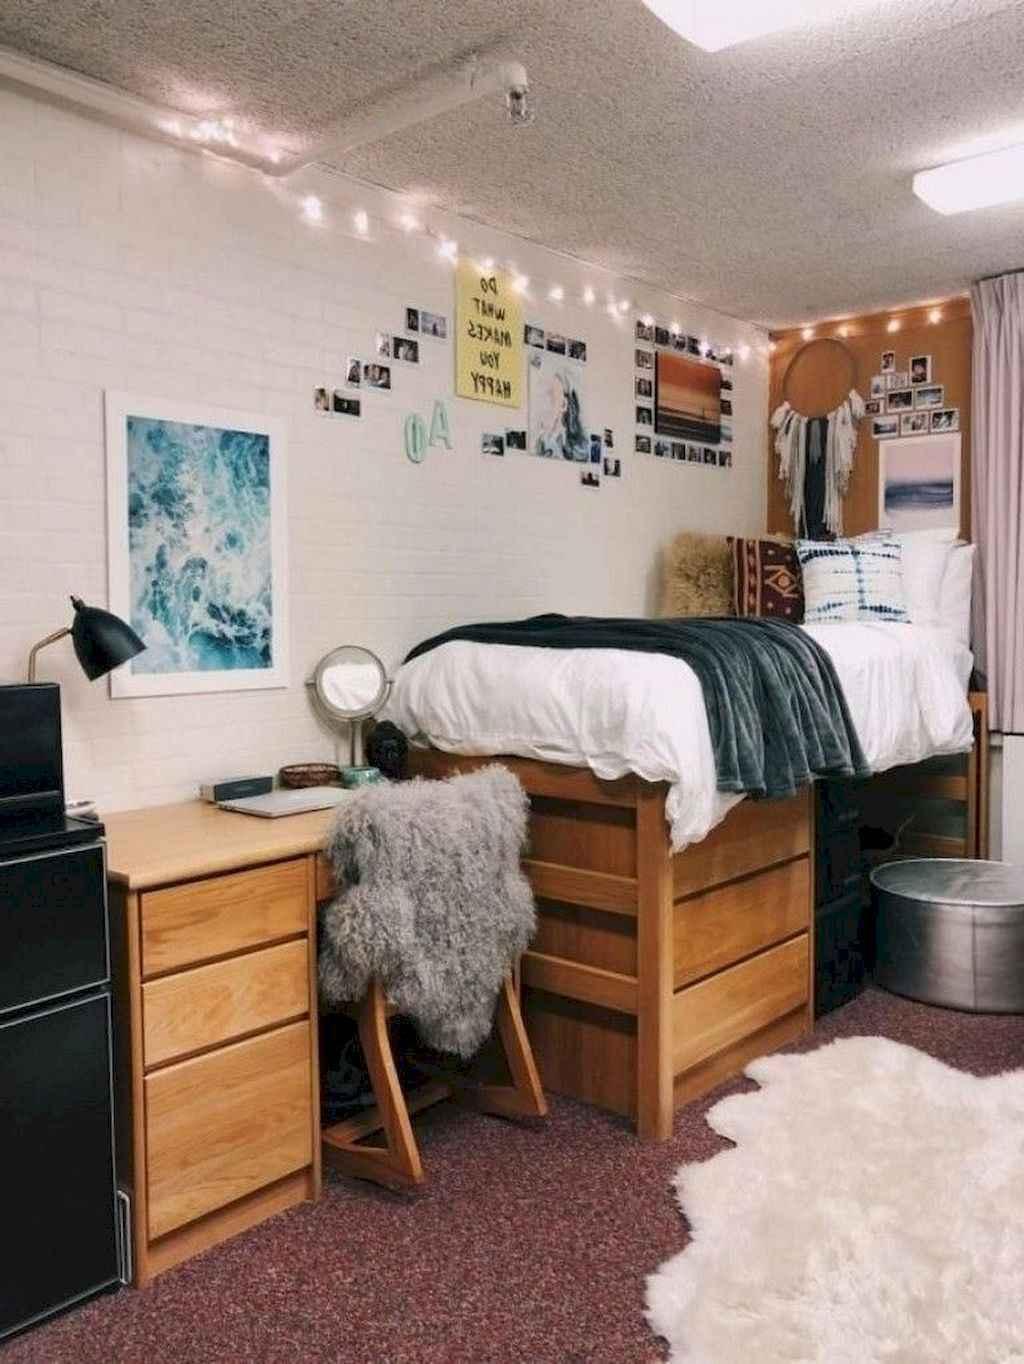 60 Cute Dorm Room Decorating Ideas on A Budget